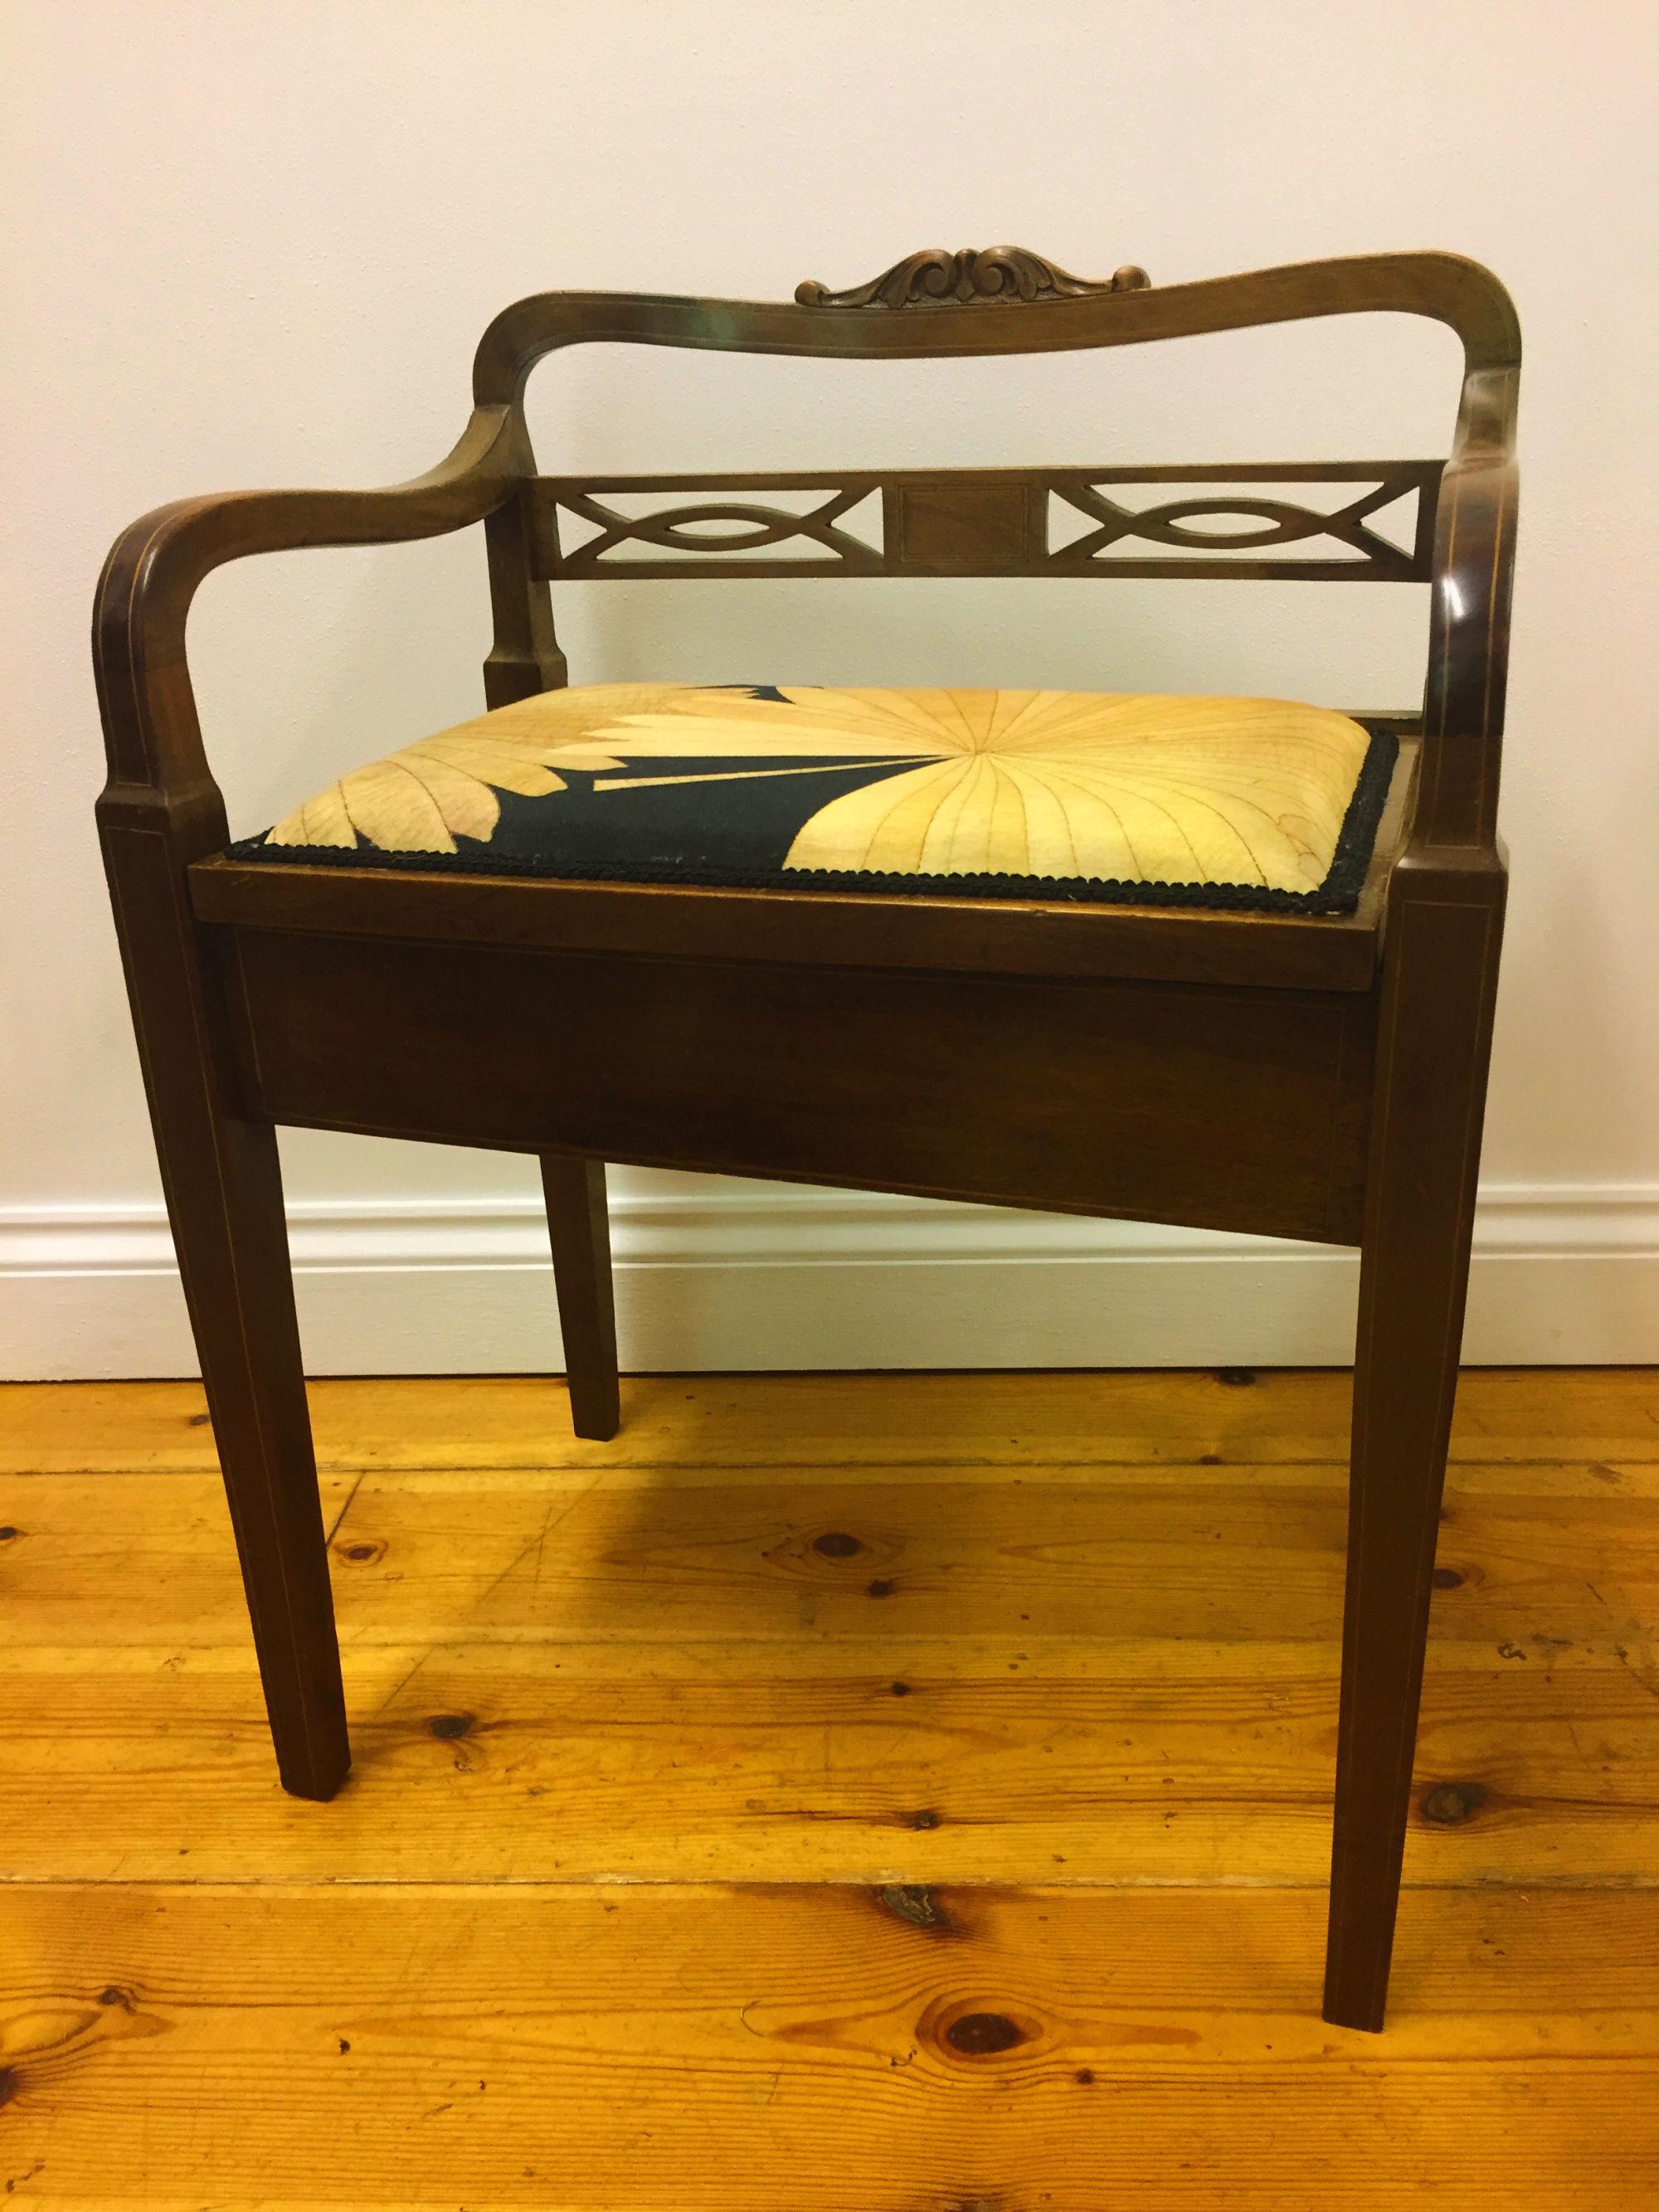 Unusual Edwardian Piano Stool With Back Rail Newly Upholstered